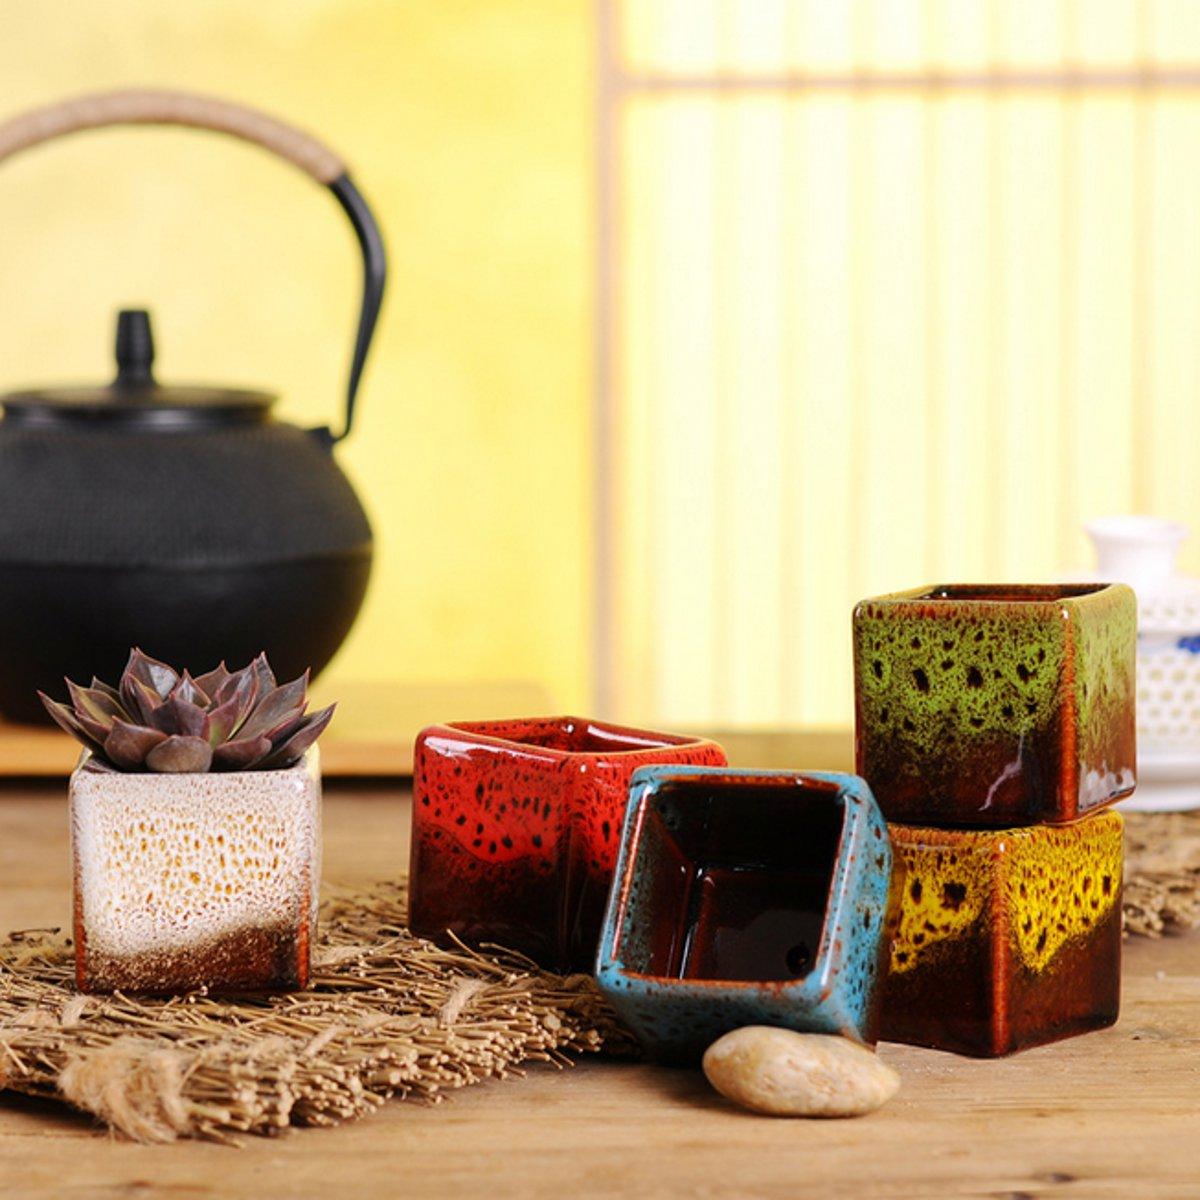 compare prices on ceramic herb planter online shopping buy low 5pcs set mini ceramic succulent cactus planter herb flower vase box glazed porcelain pot garden